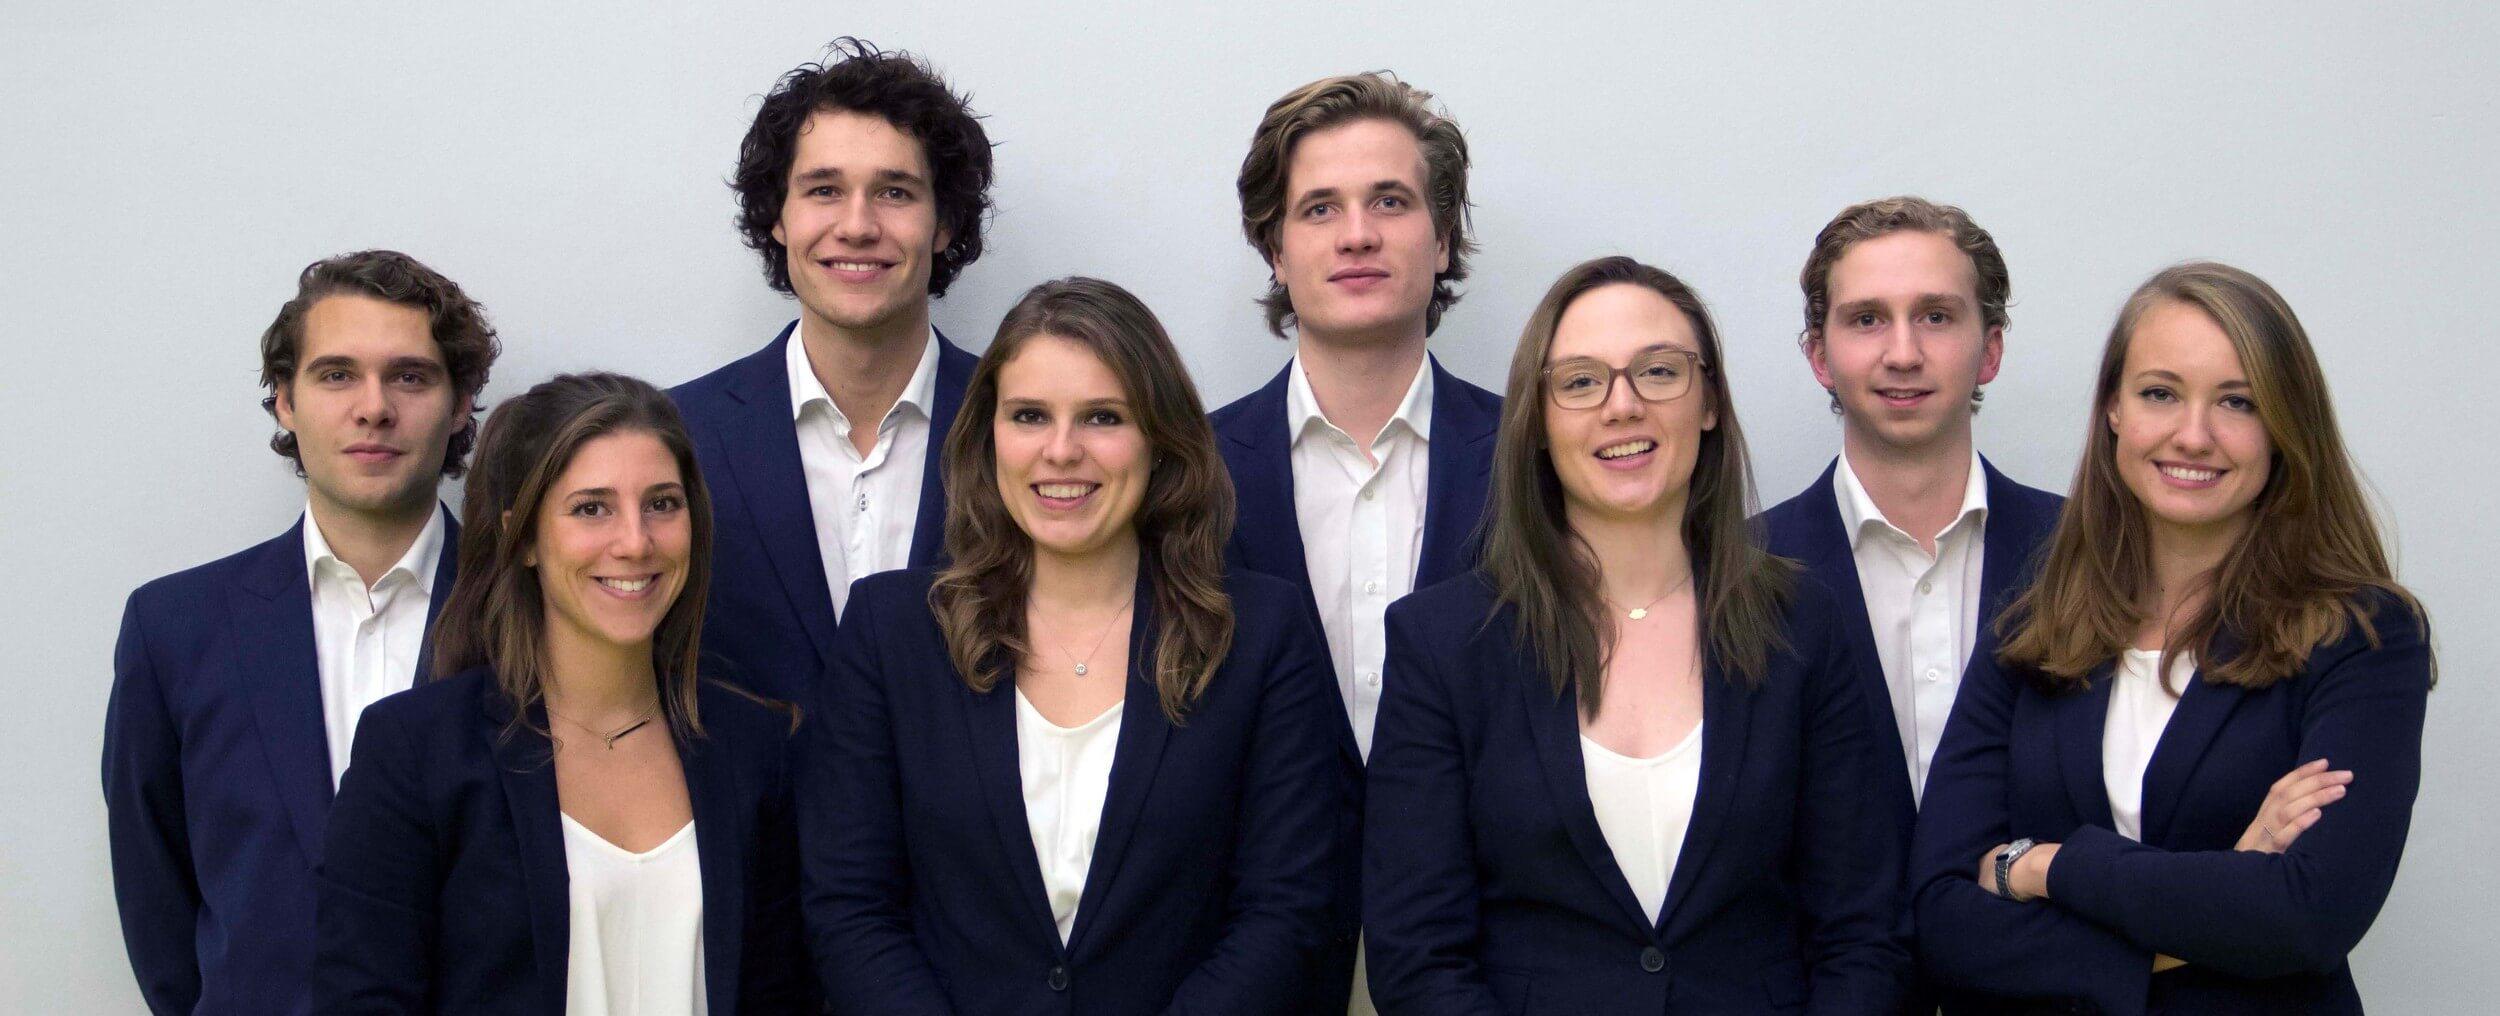 ACD+Committee+Amsterdamse+Carriere+Dagen+Bestuur+2015 Pak Student Bestuur Vereniging De Oost Bespoke Academy.jpg